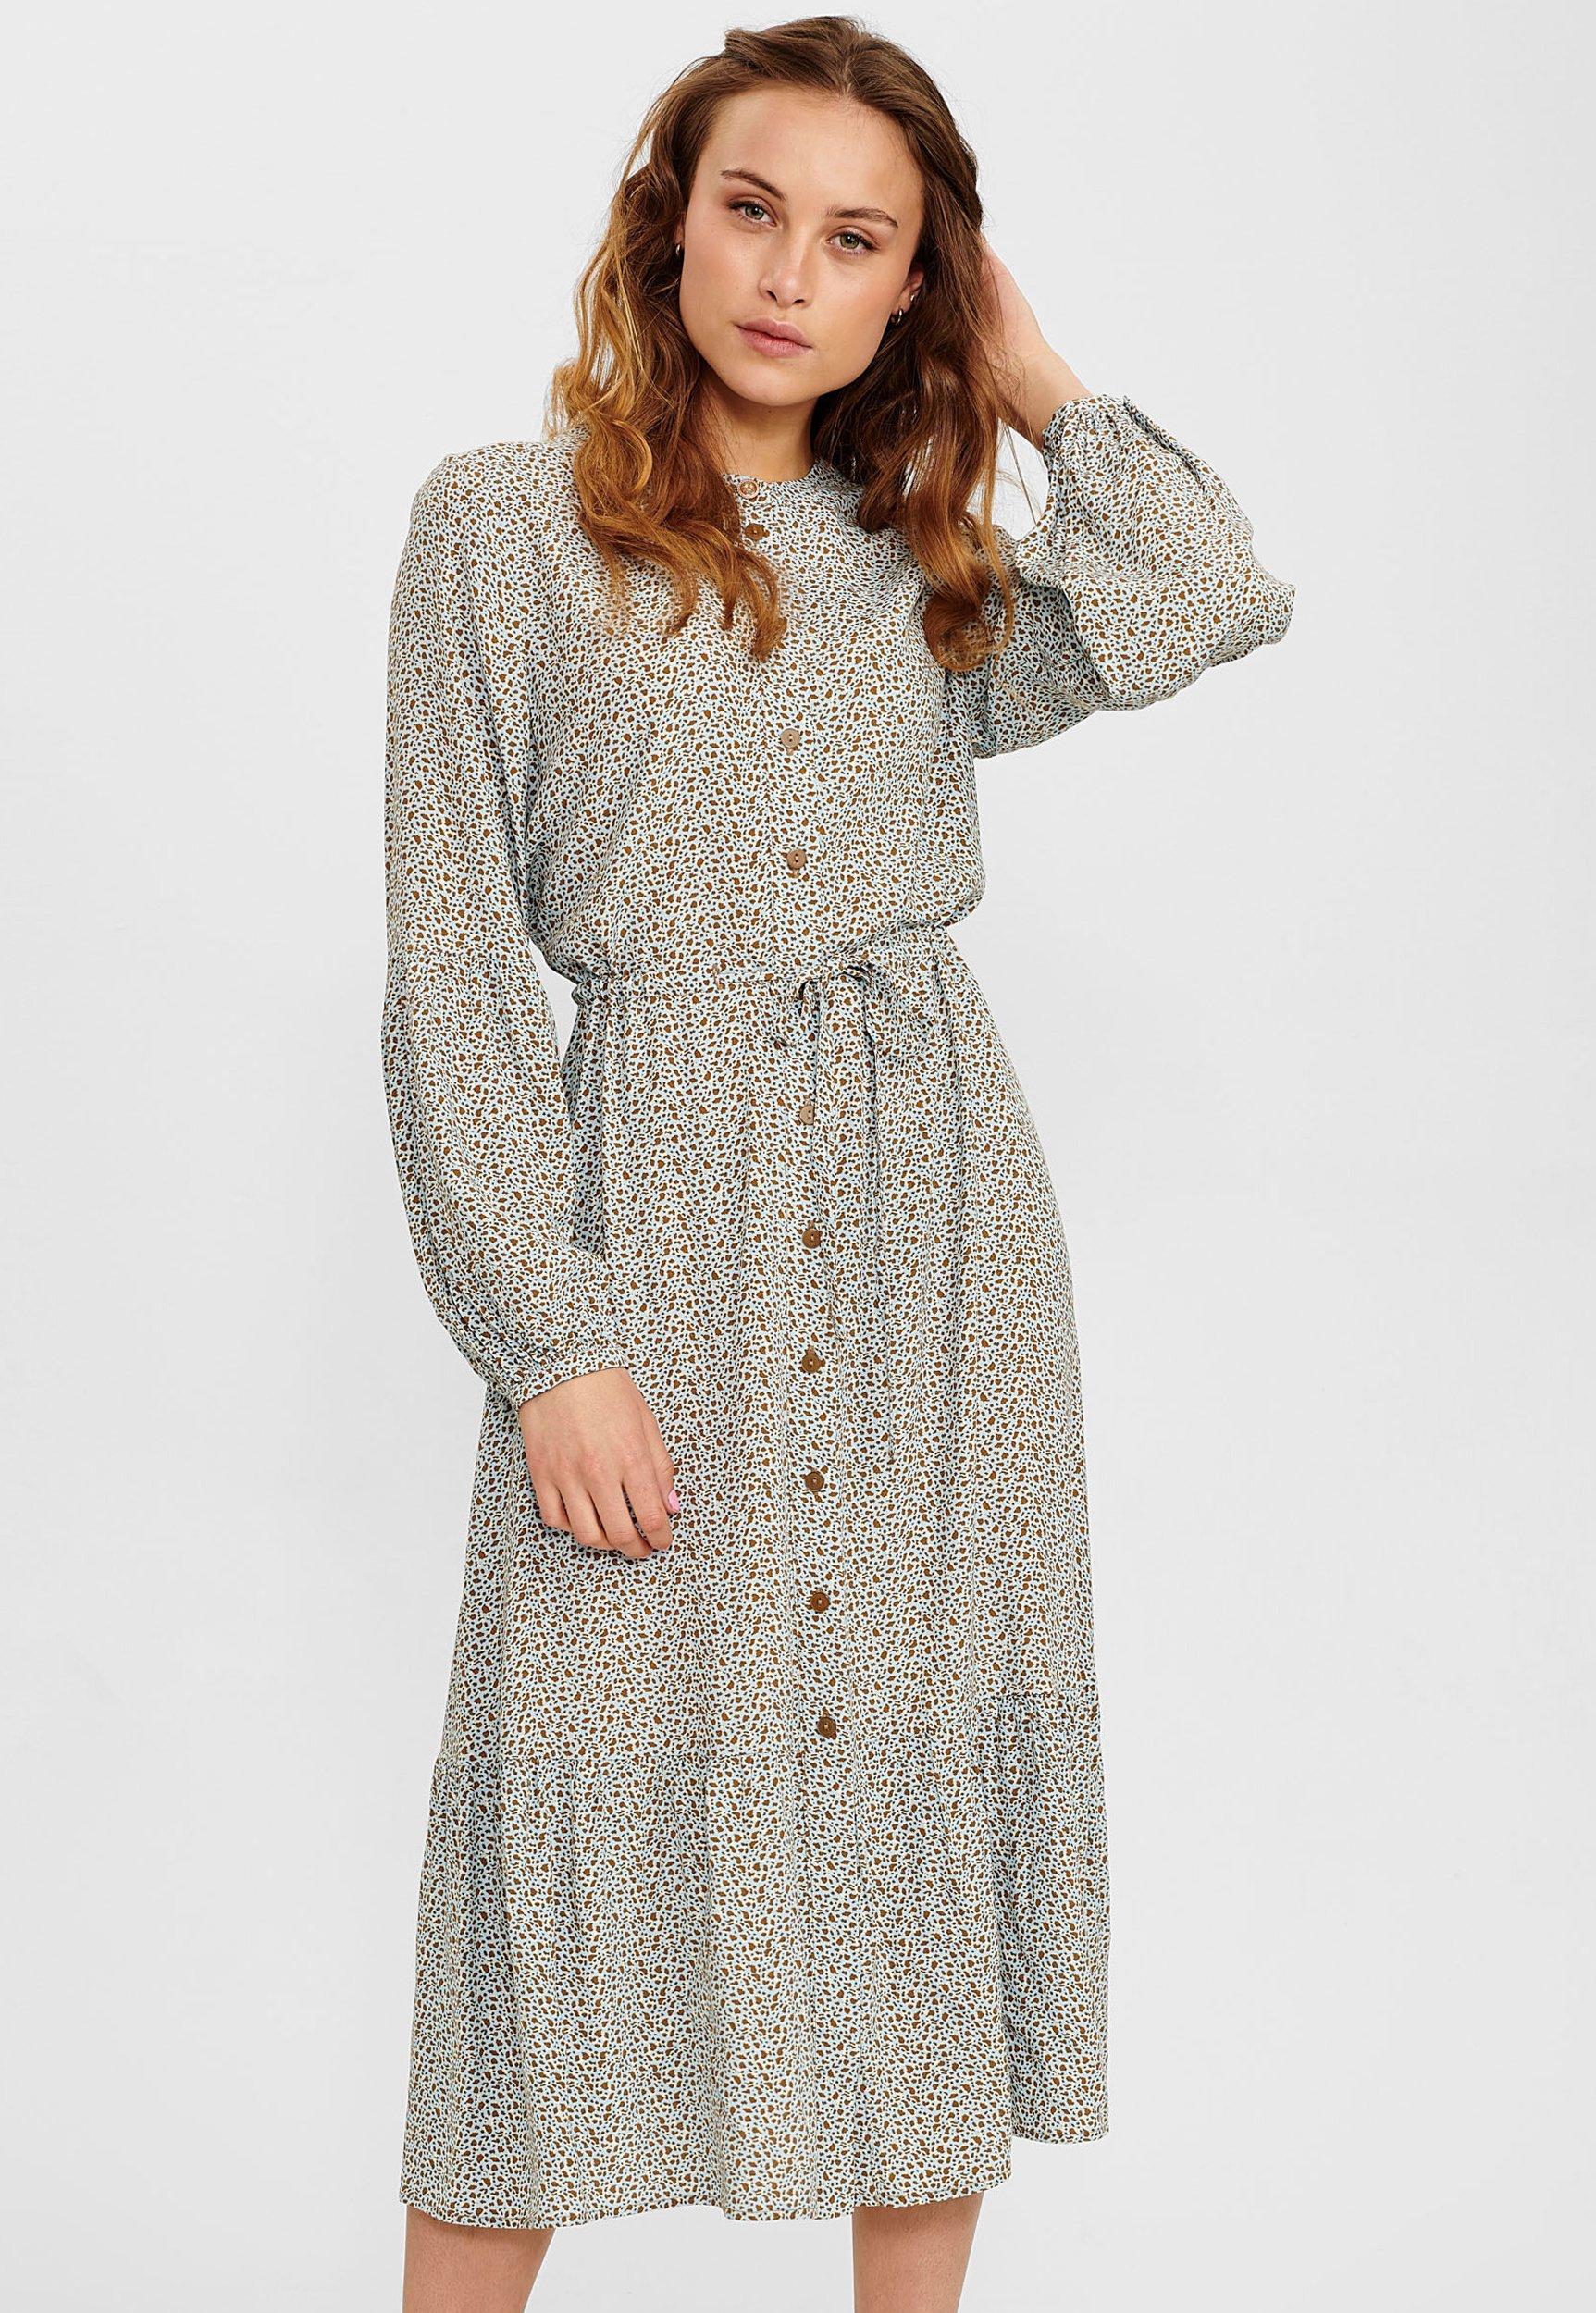 Nümph - Nucecilia Shirt Dress REA 70%